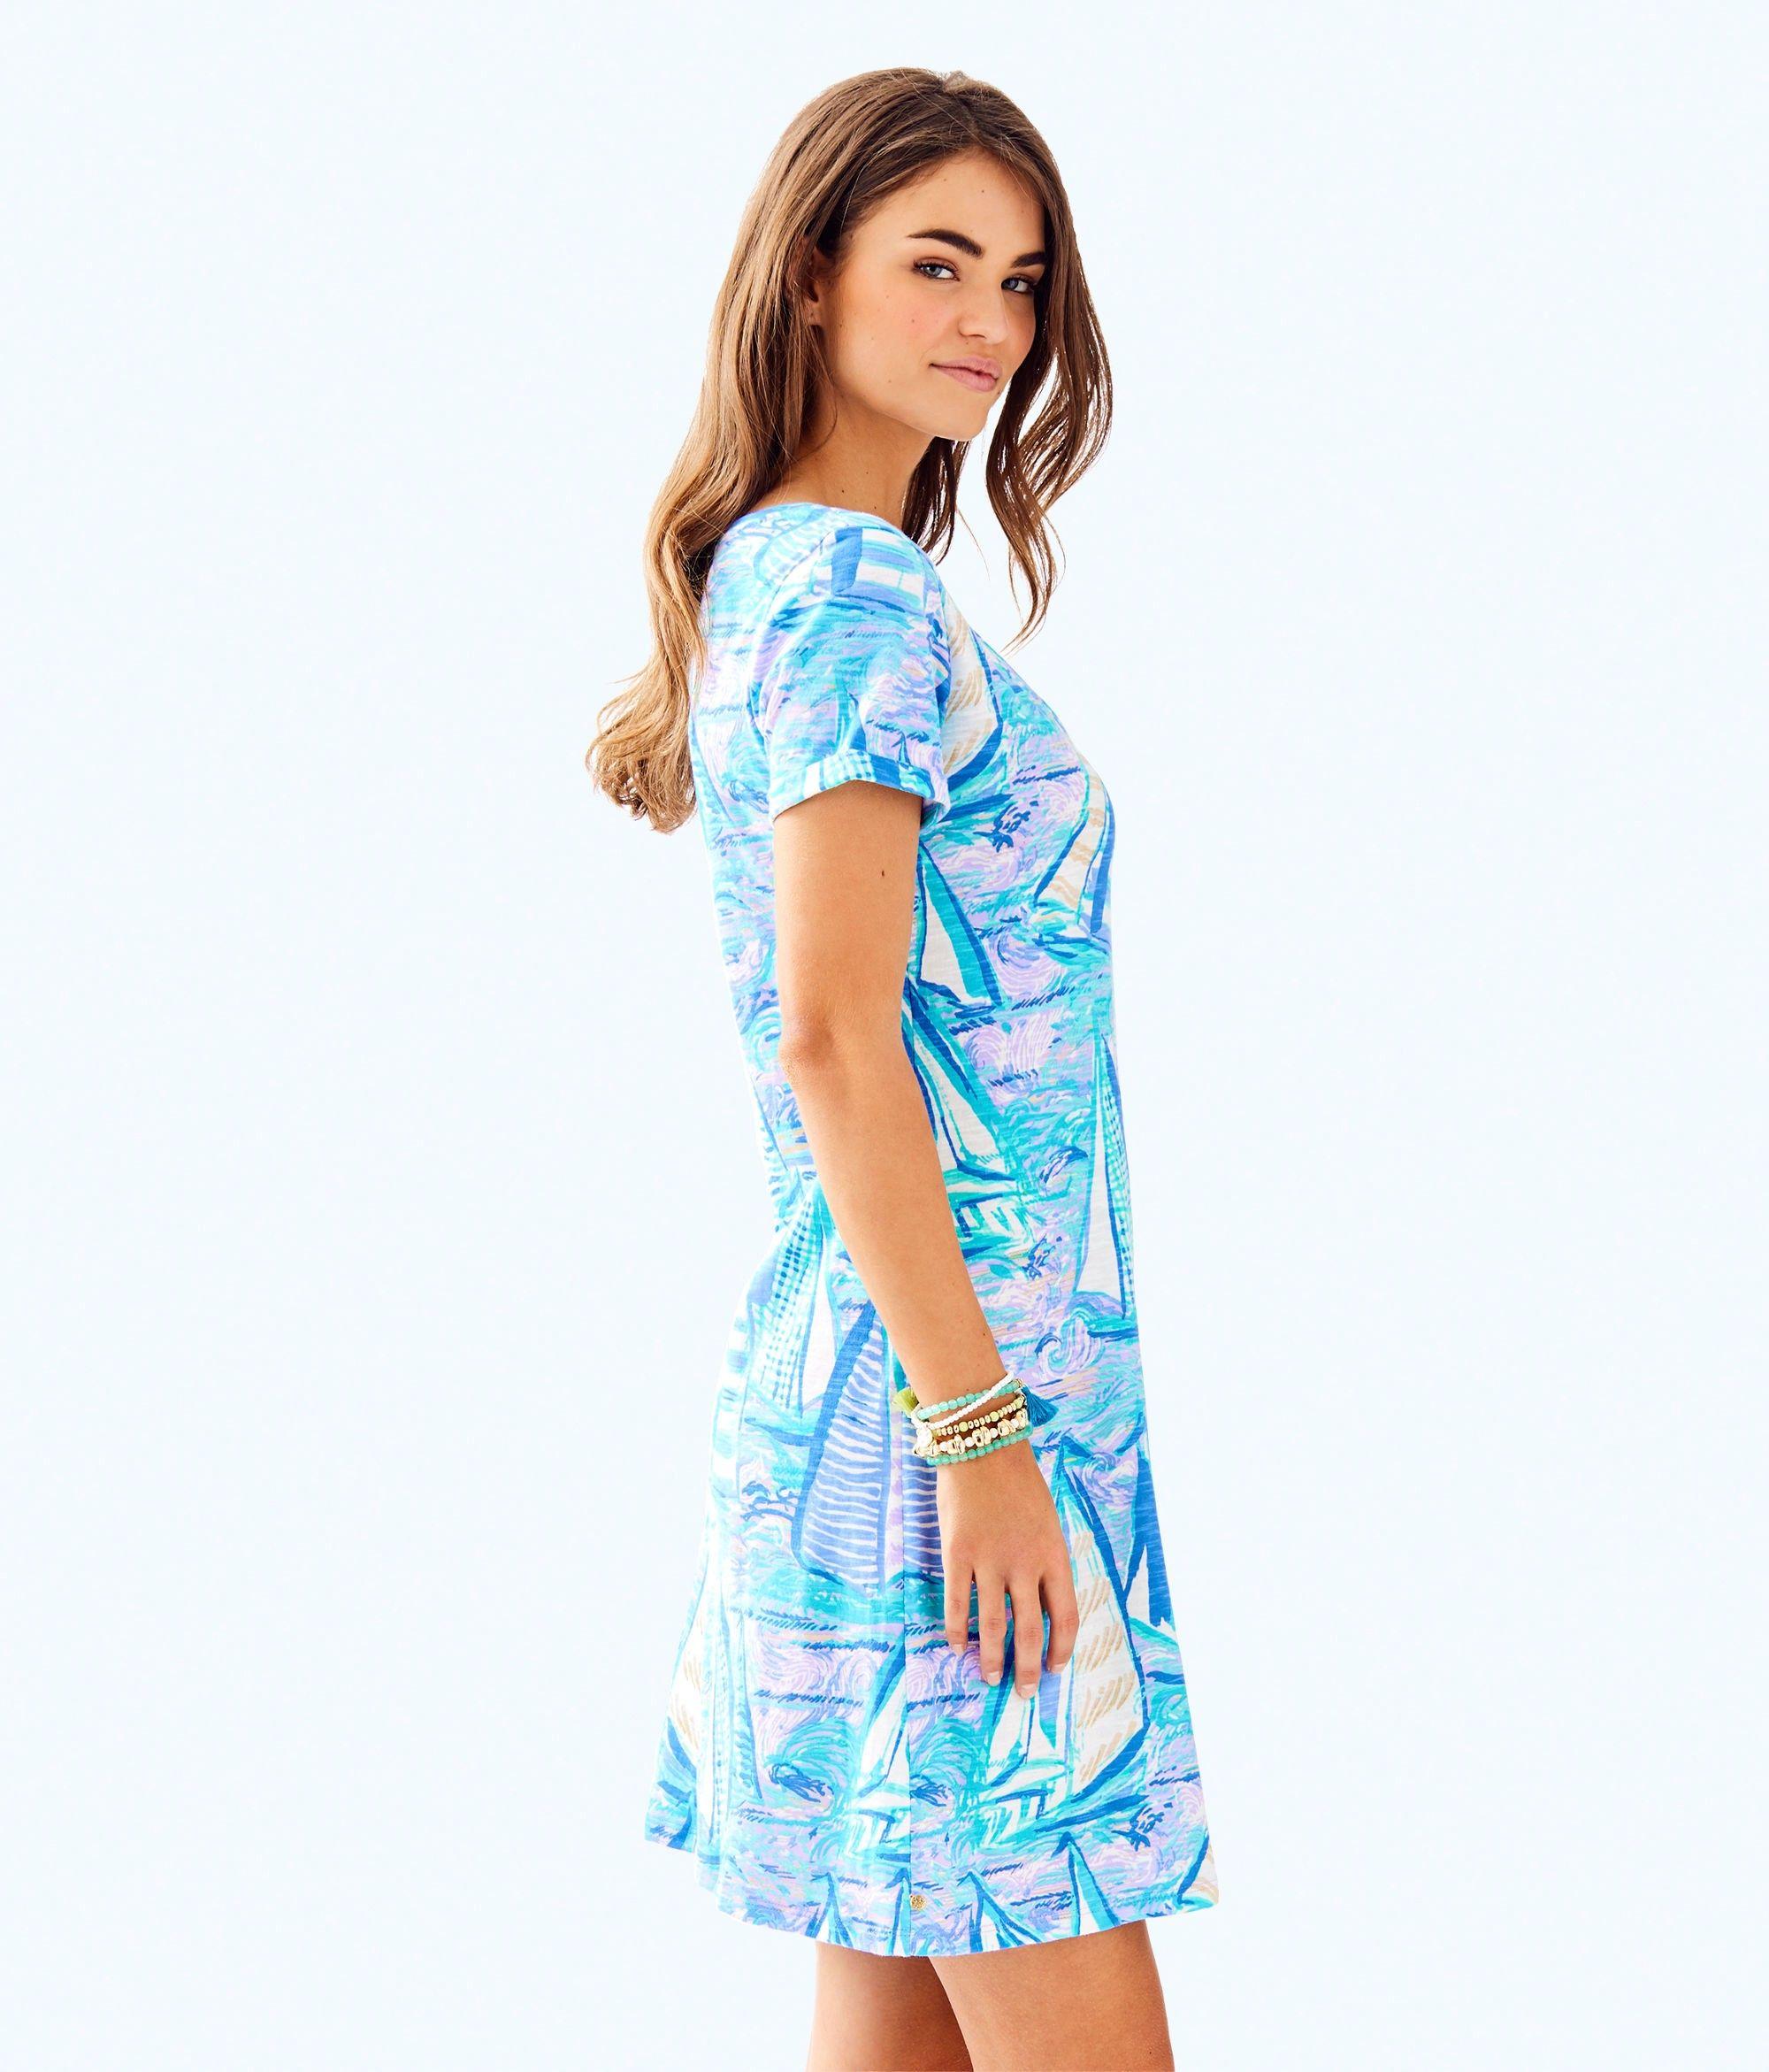 ca1c2403835c42 Lilly Pulitzer Jessica Short Sleeve Dress - XXS | Products | Short ...